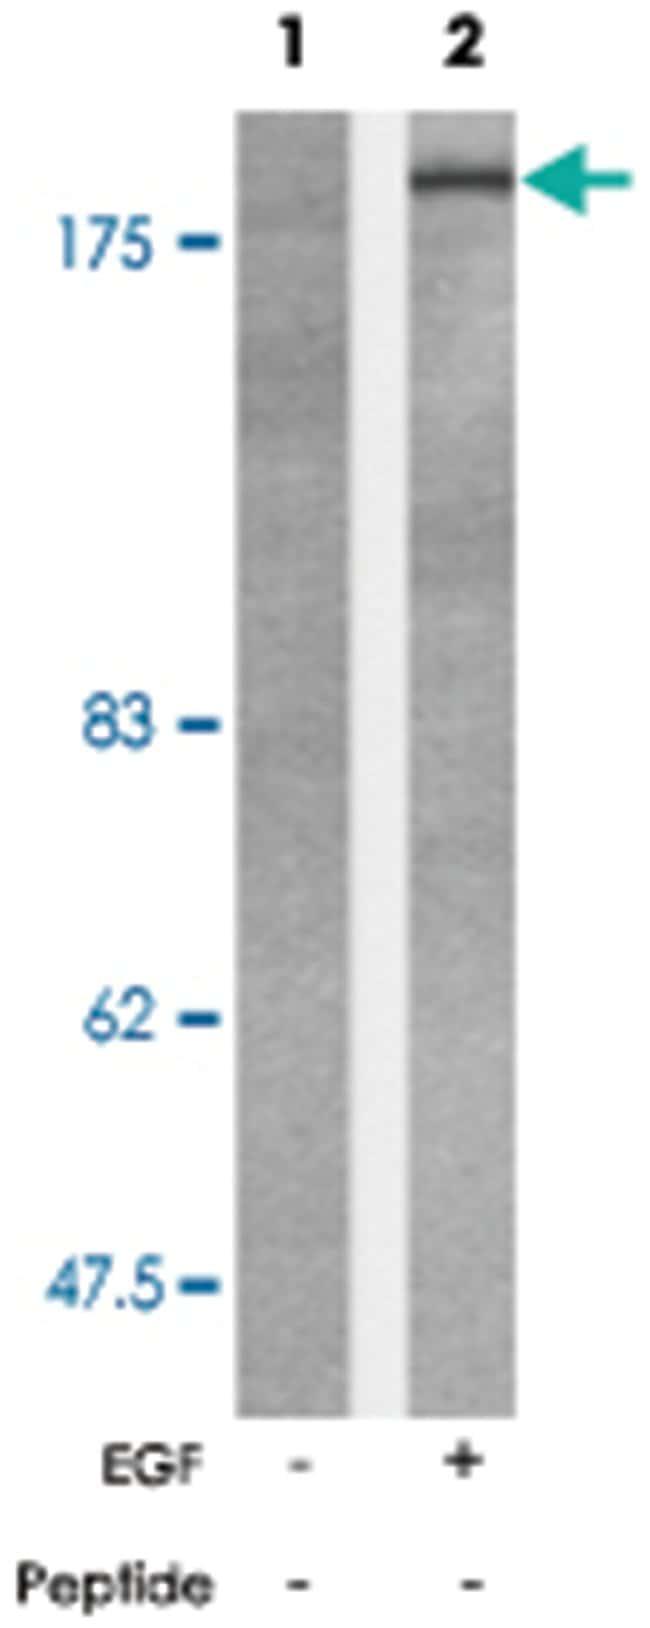 BCR (phospho Y177), Rabbit anti-Human, Mouse, Polyclonal Antibody, Abnova